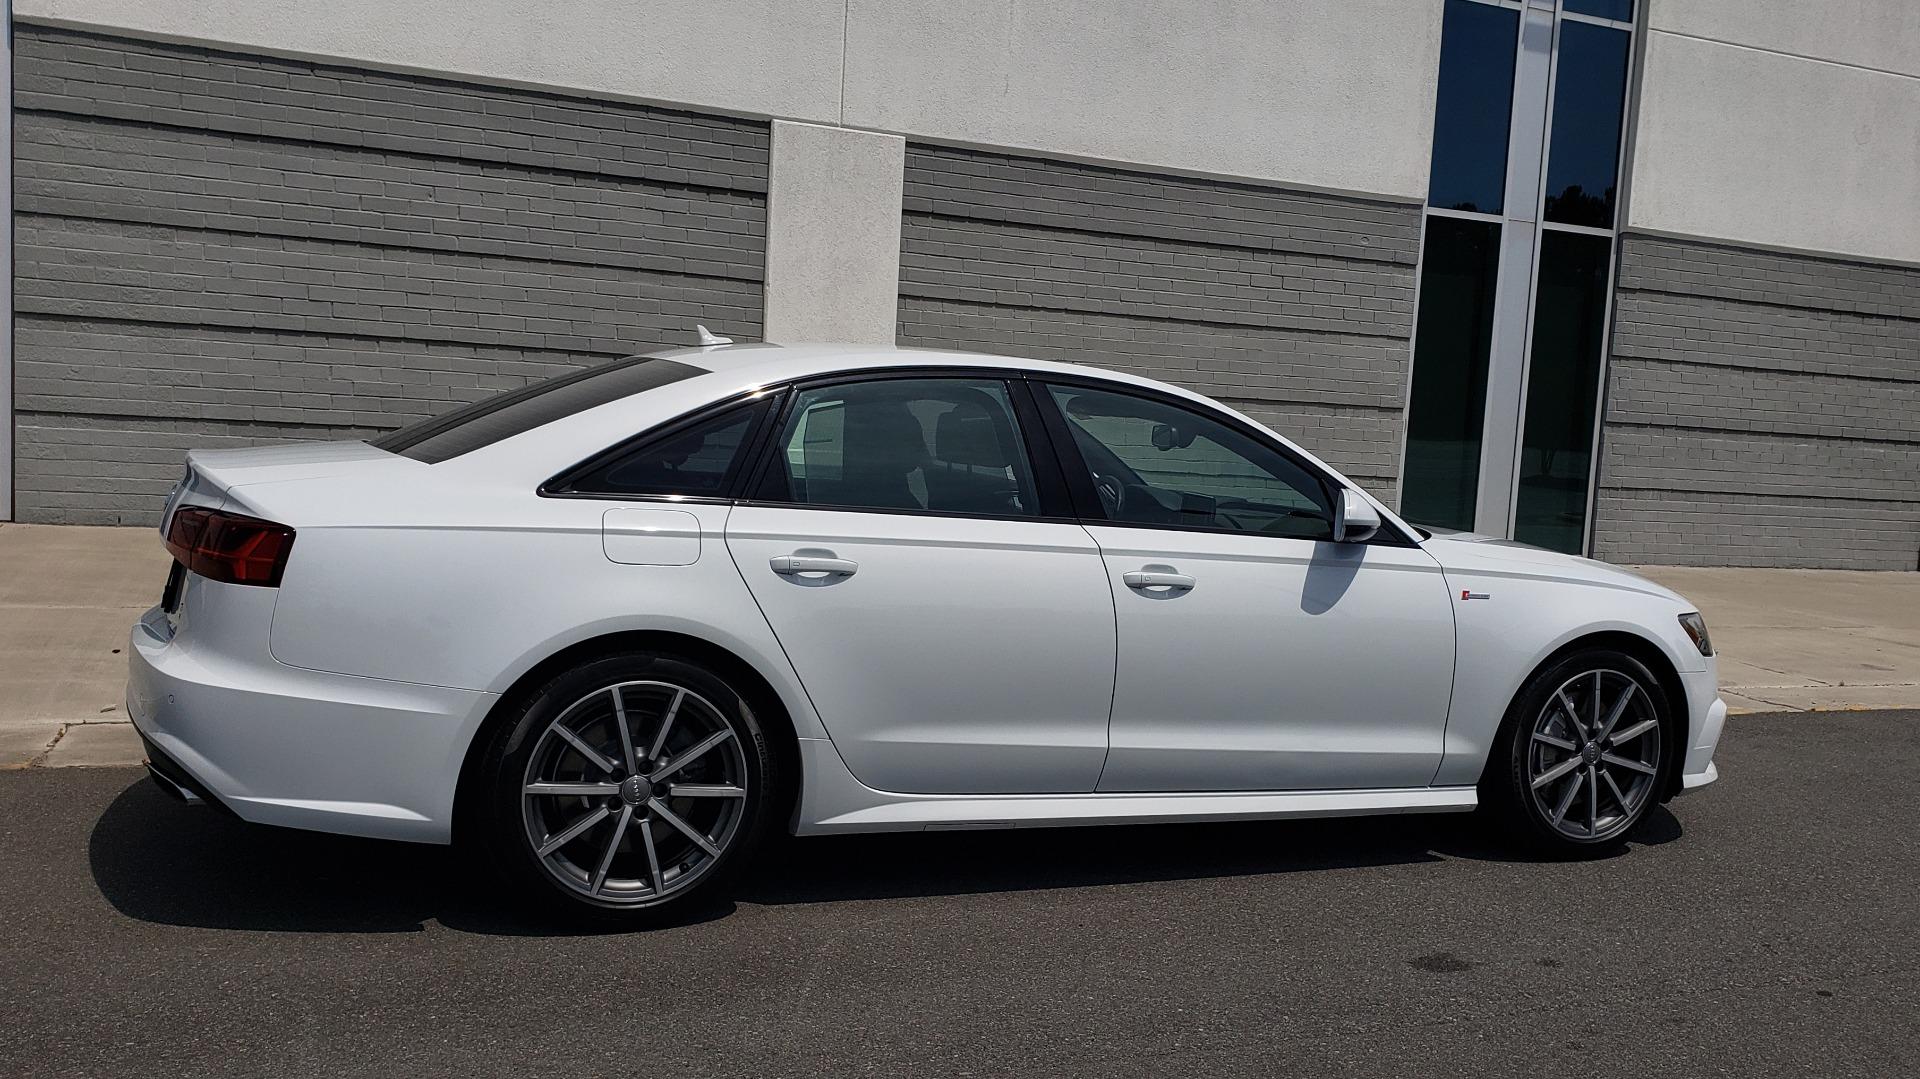 Used 2017 Audi A6 PRESTIGE SEDAN 3.0T / NAV / SUNROOF / BLACK OPTIC / CLD WTHR / REARVIEW for sale $30,797 at Formula Imports in Charlotte NC 28227 9